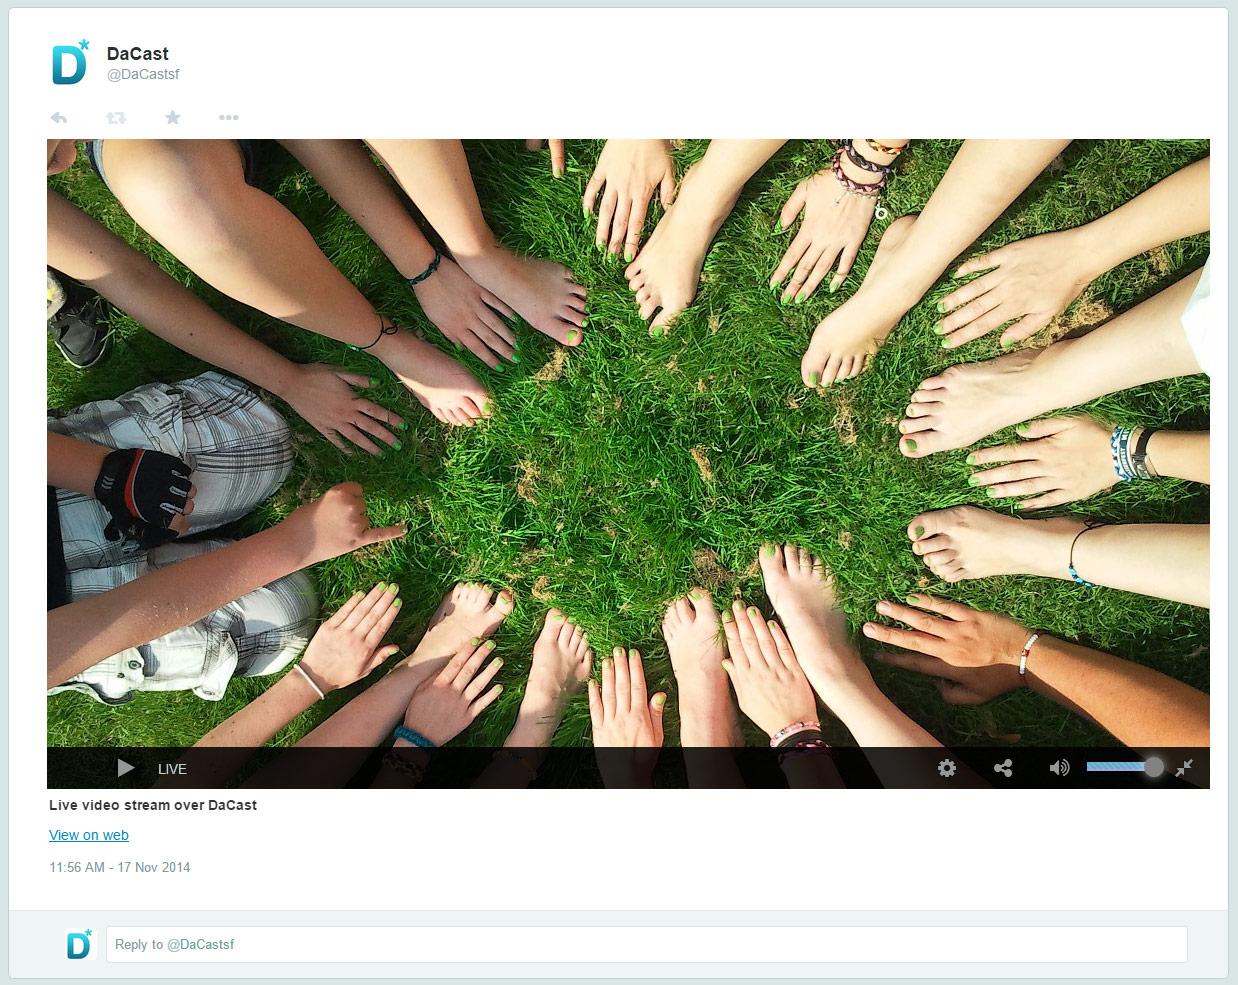 benefits 365 Online Community Relationship